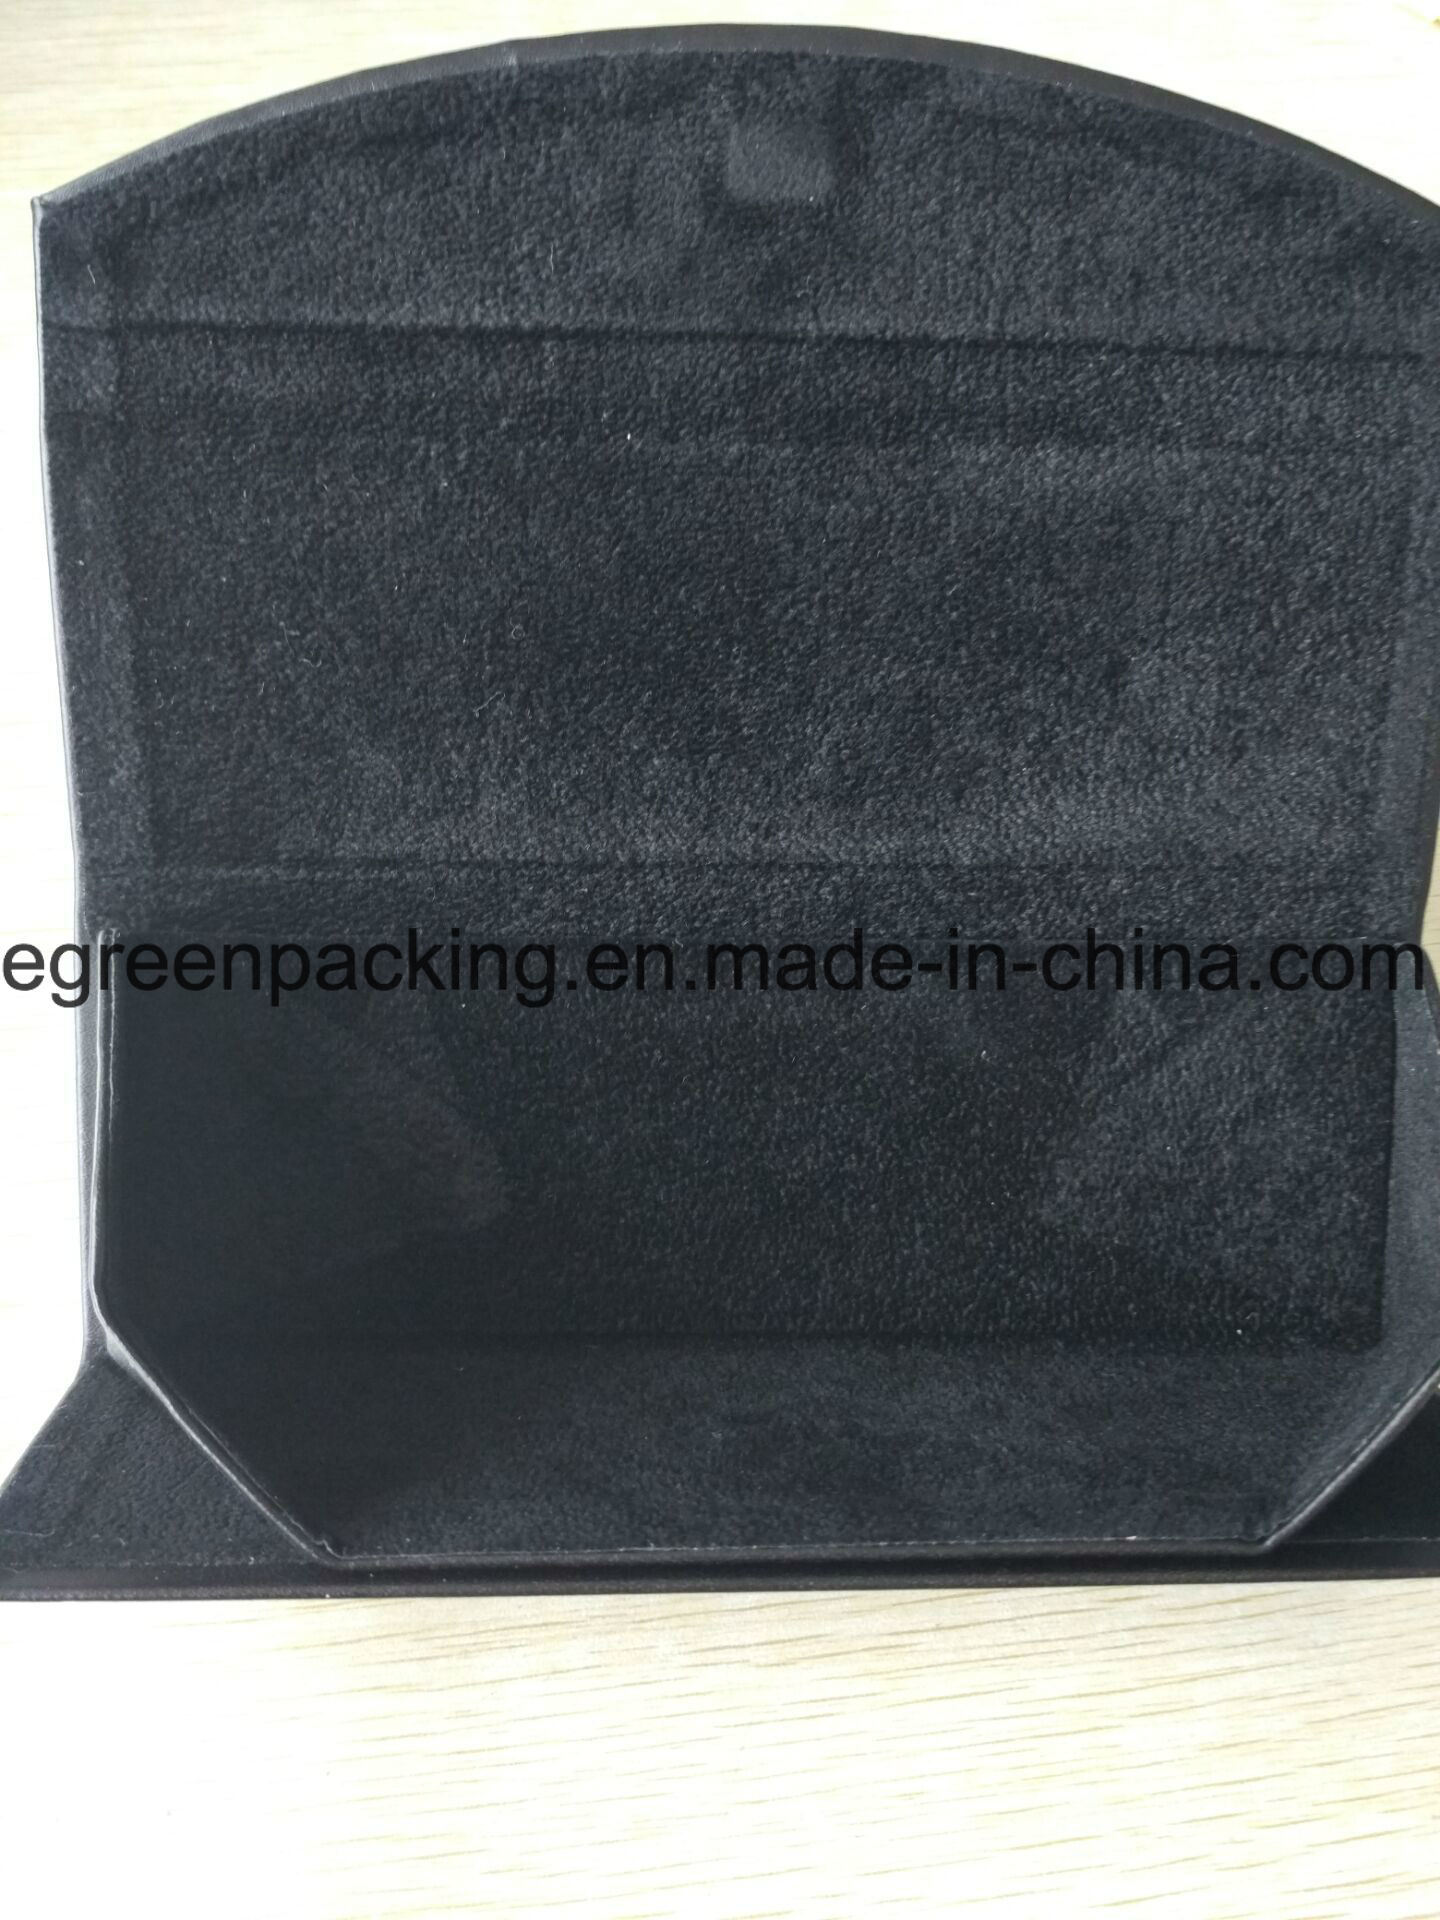 Eyeglasses Handcrafted Case /Triangle Folding Case (PZ1)